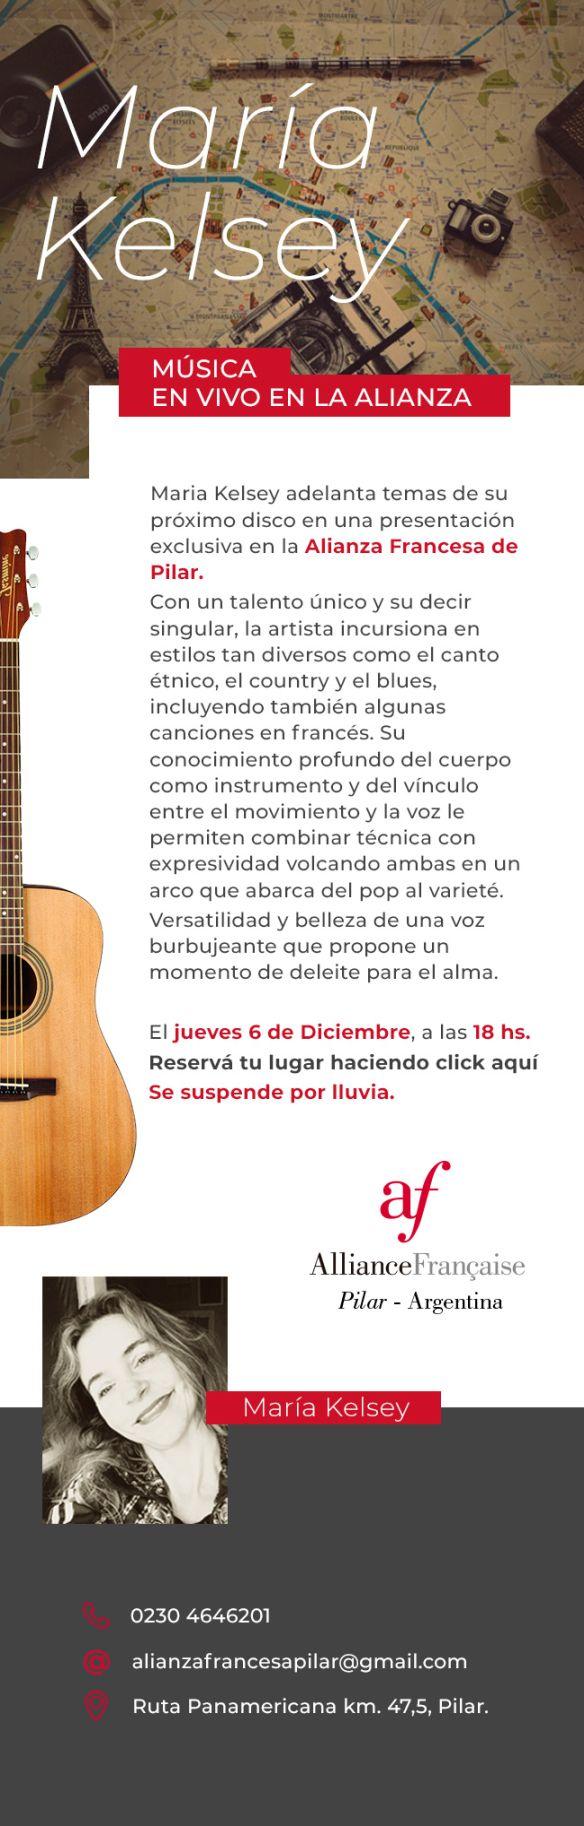 Recital gratuito al aire libre en la Alianza Francesa de Pilar